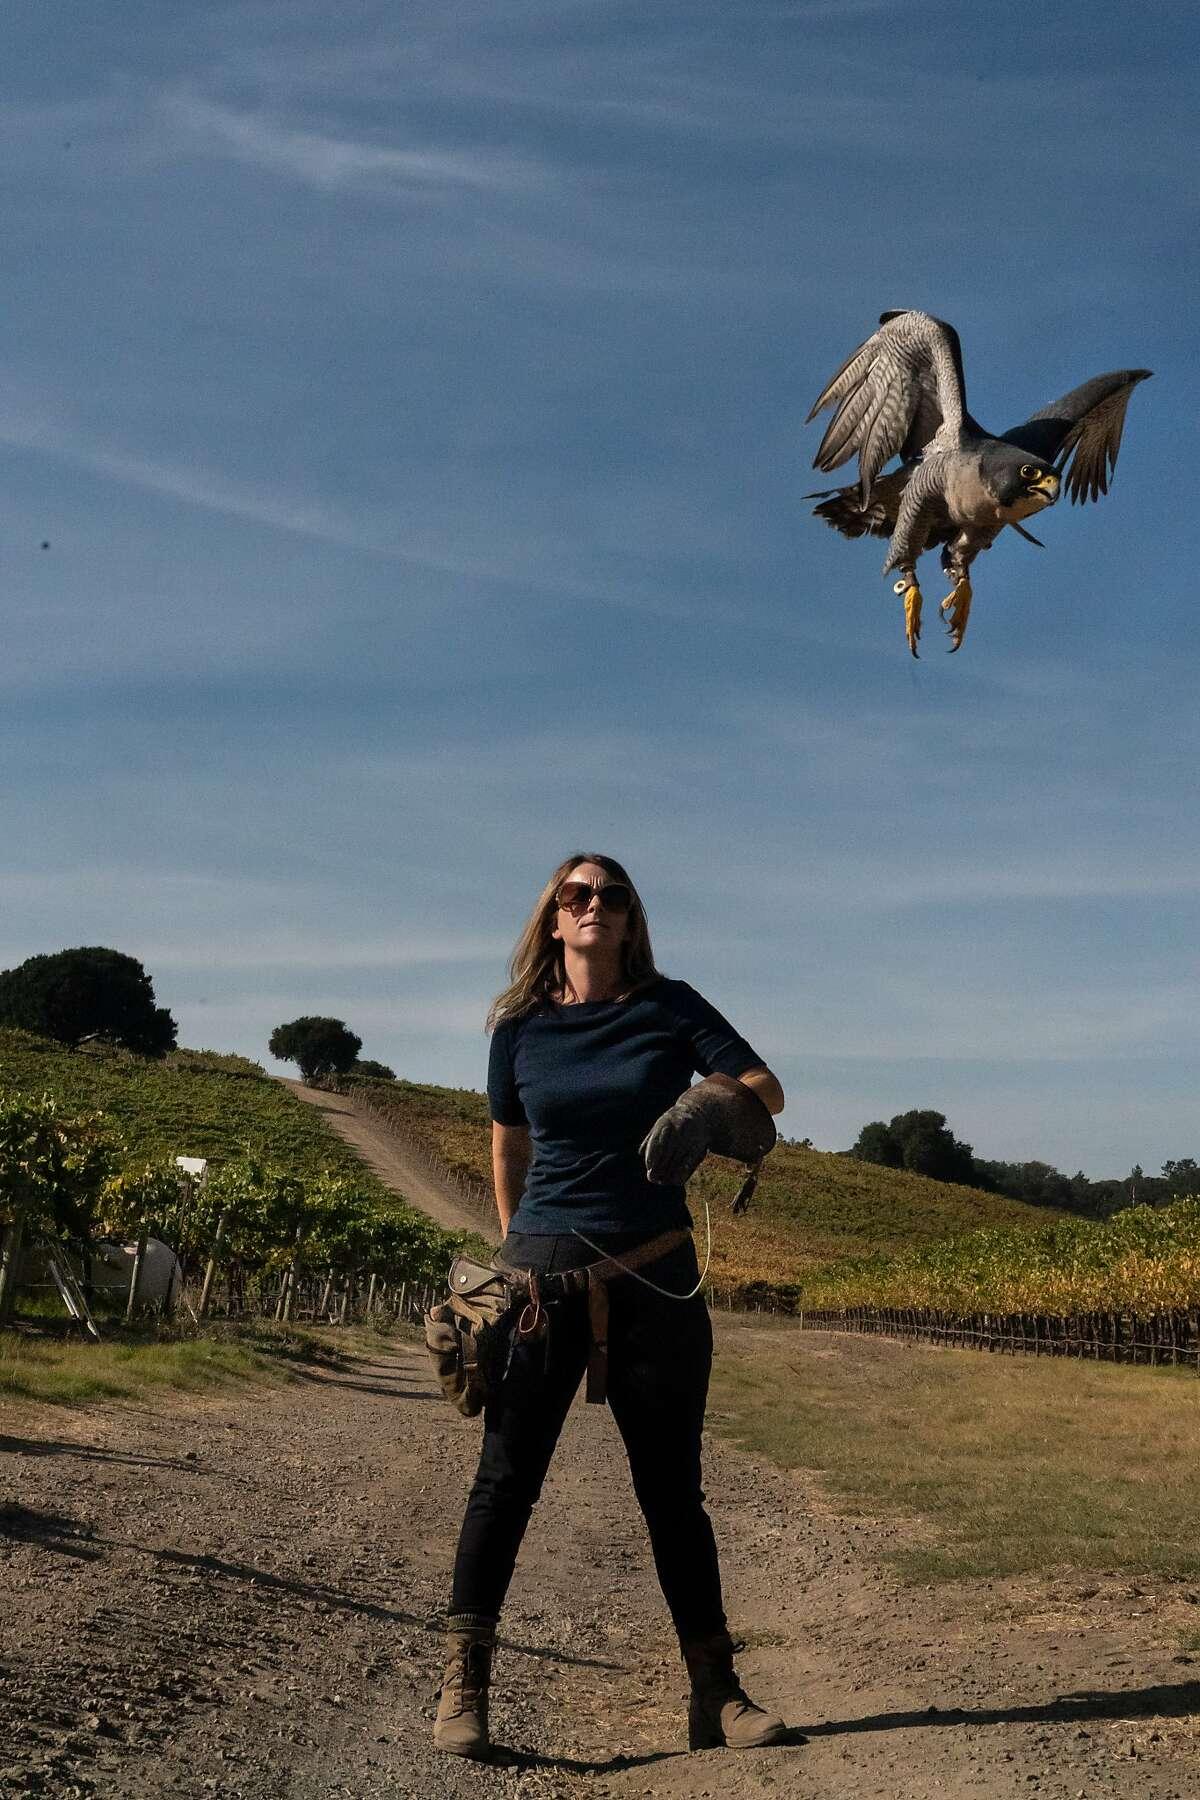 Rambo, a peregrine falcon, takes off from Rebecca Rosen on Saturday, Oct. 12, 2019, in Napa, Calif.